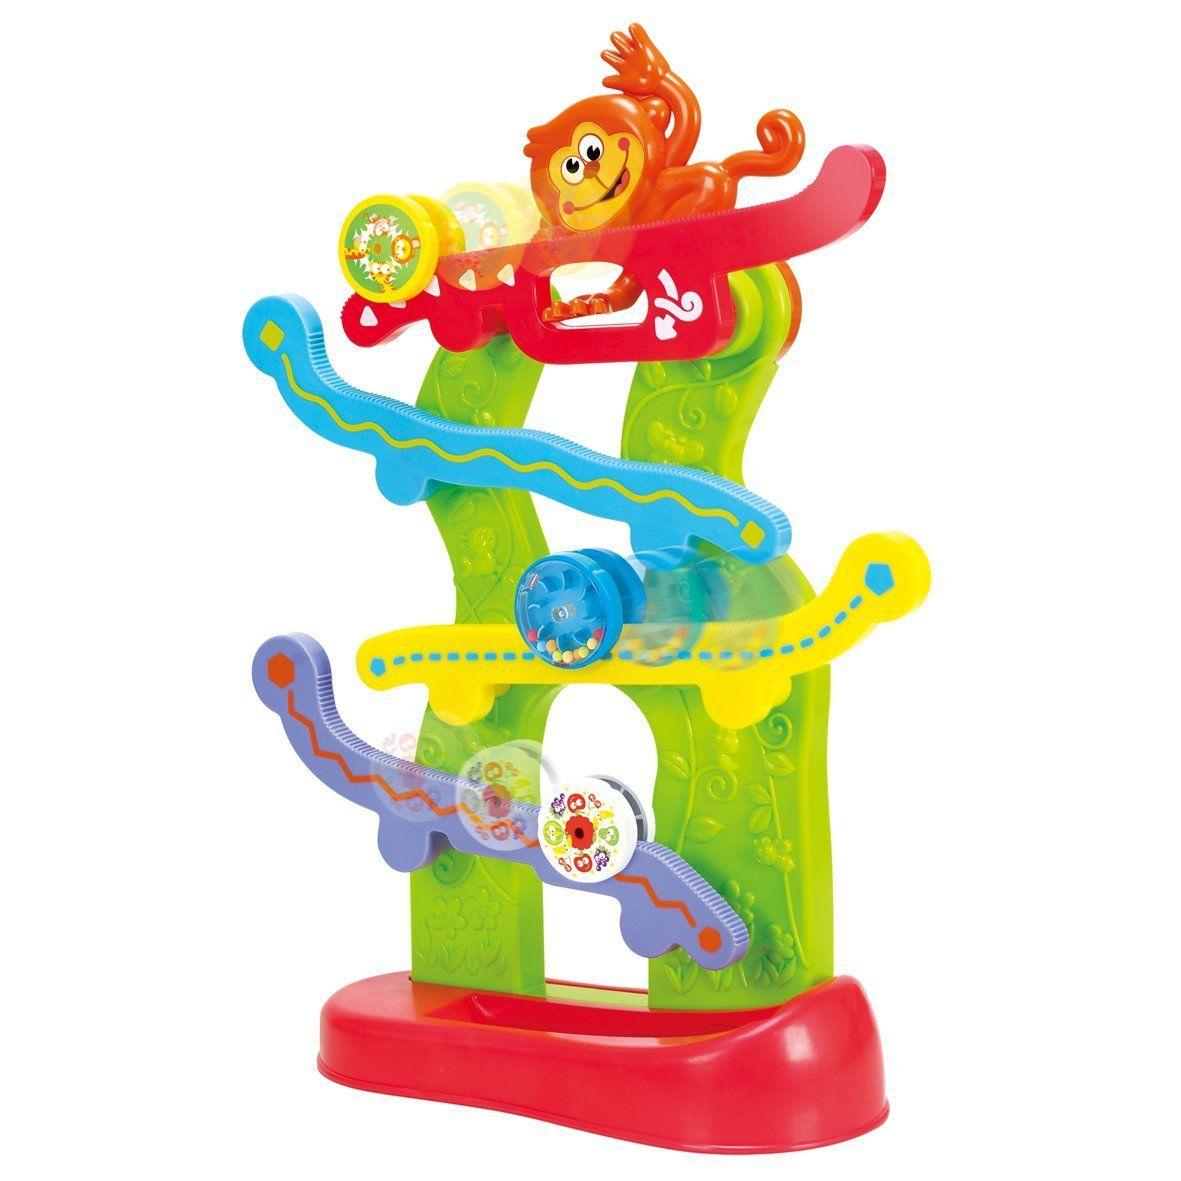 Игрушка развивающая - Лабиринт с обезьянкойРазвивающие игрушки PlayGo<br>Игрушка развивающая - Лабиринт с обезьянкой<br>